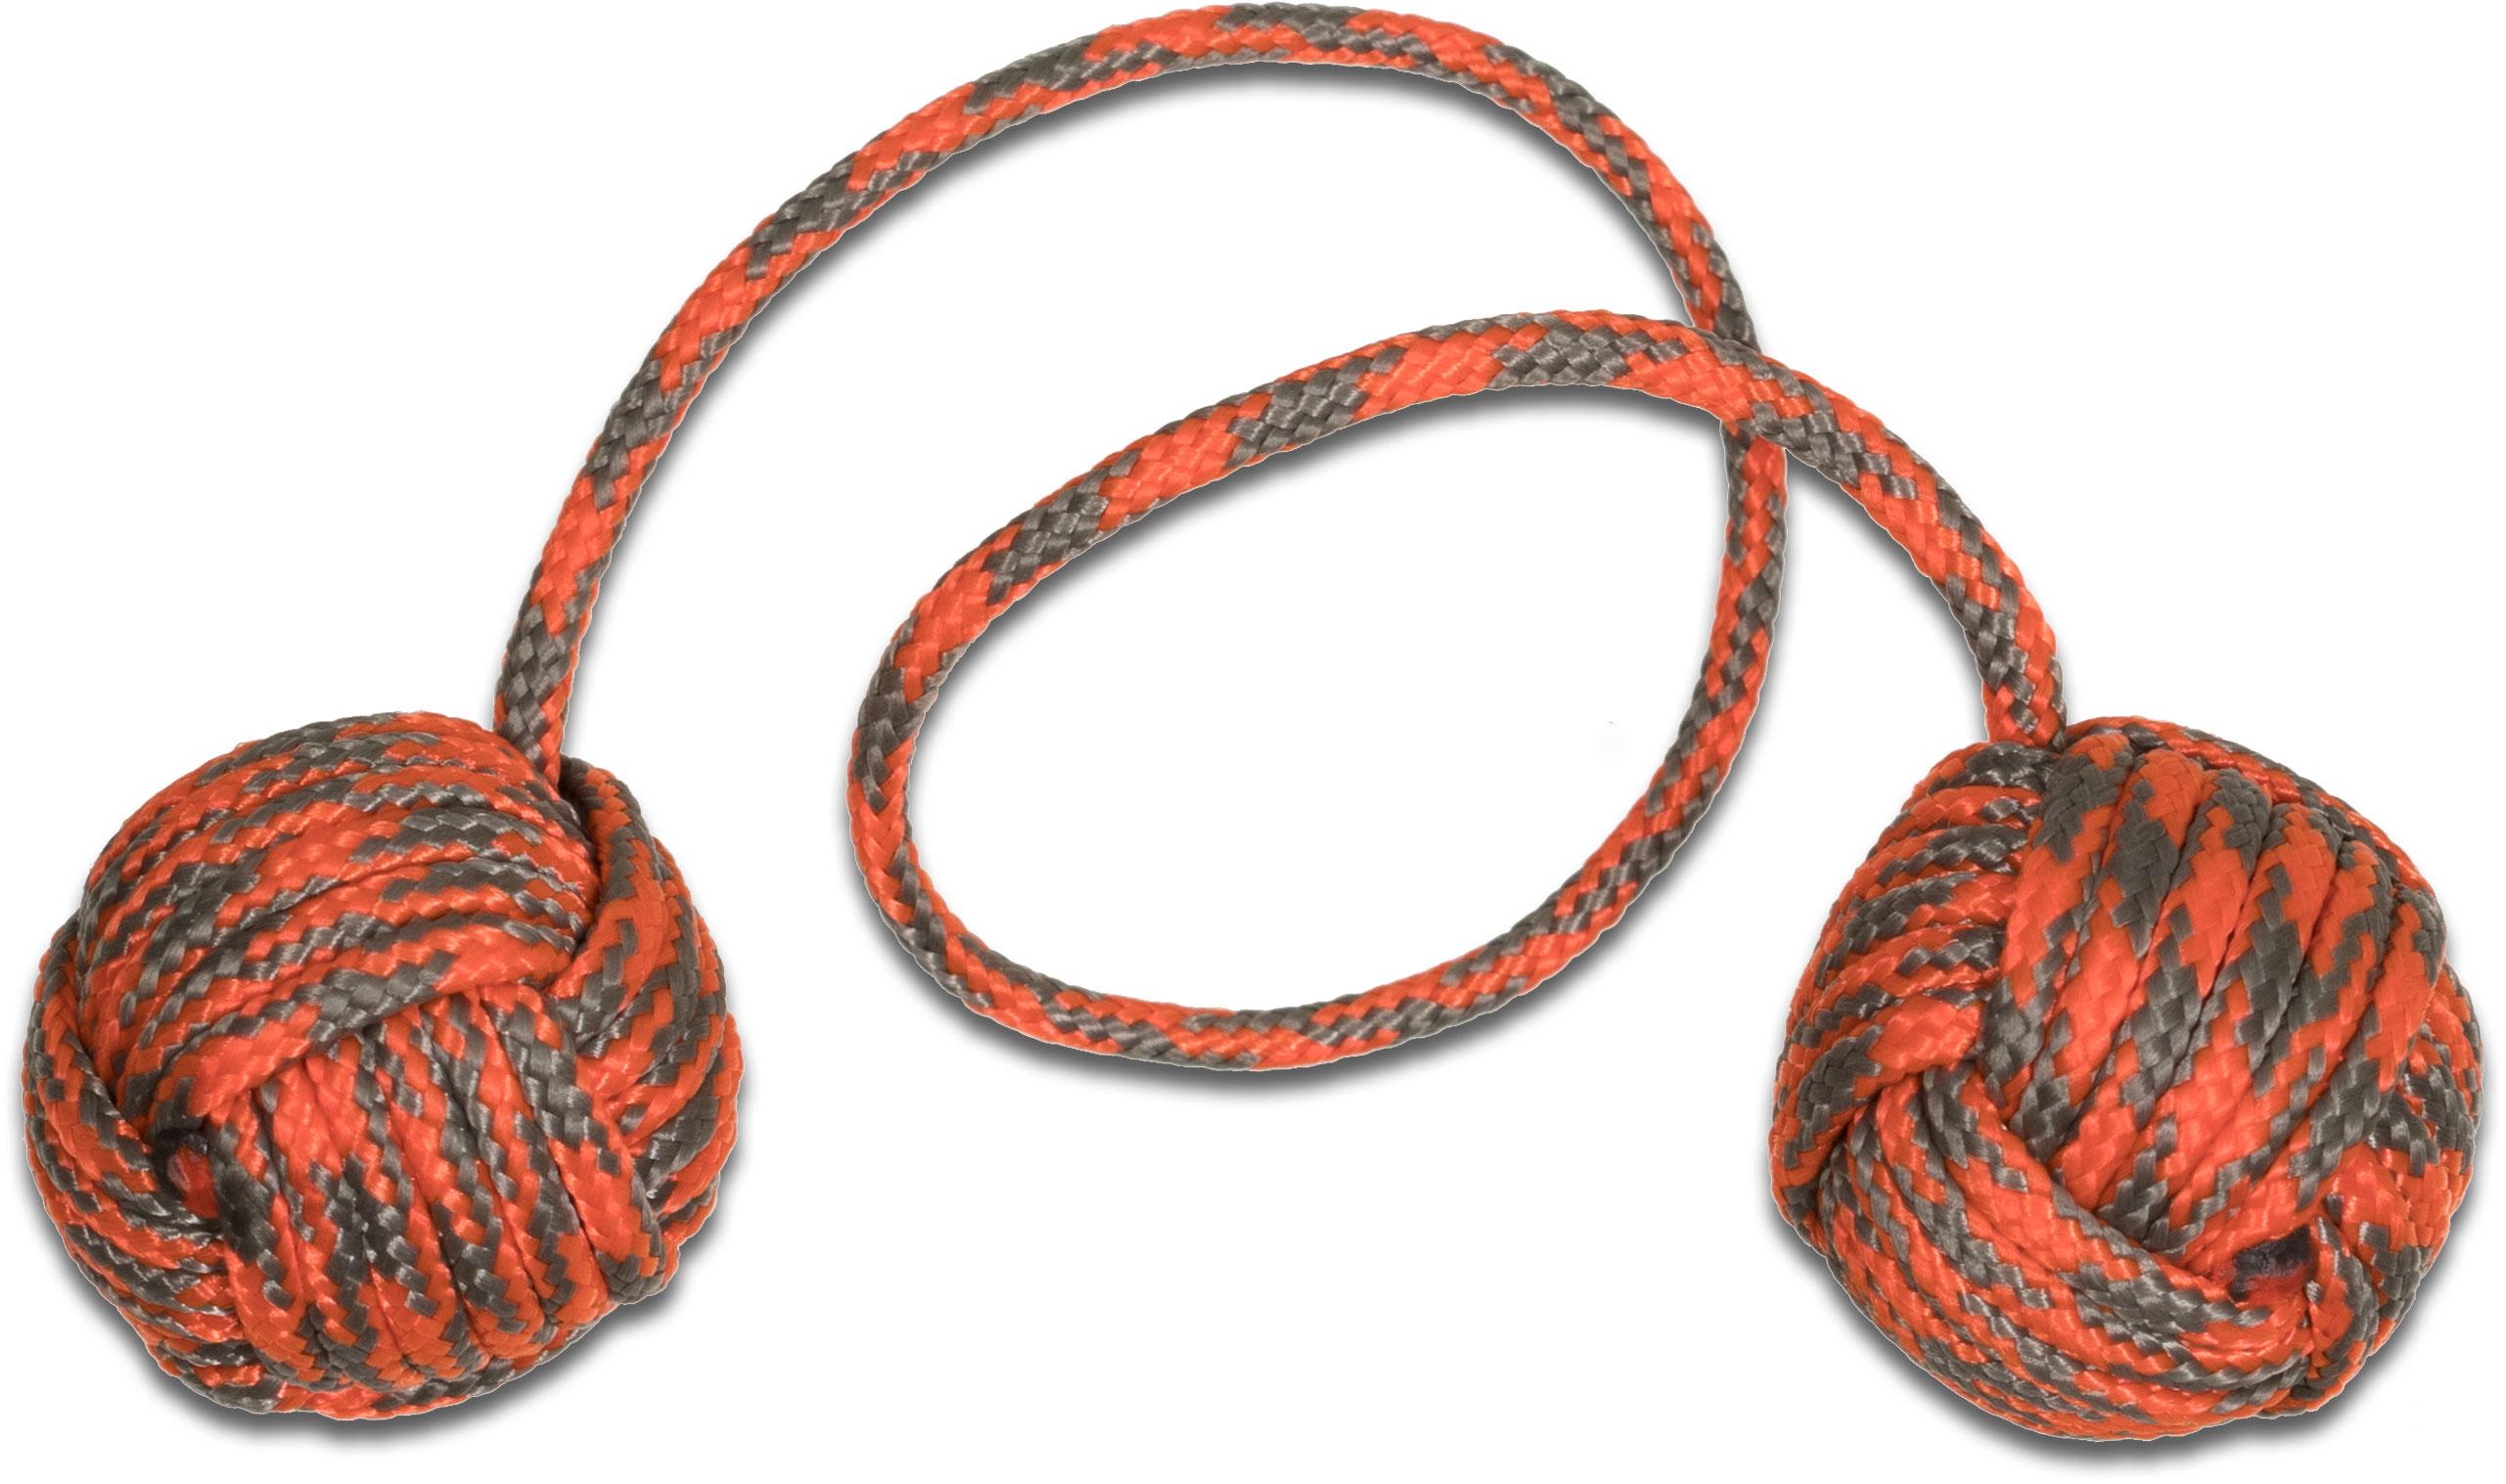 Monkey Fist Begleri KnifeCenter Exclusive 5.5 inch Orange/Gray Paracord